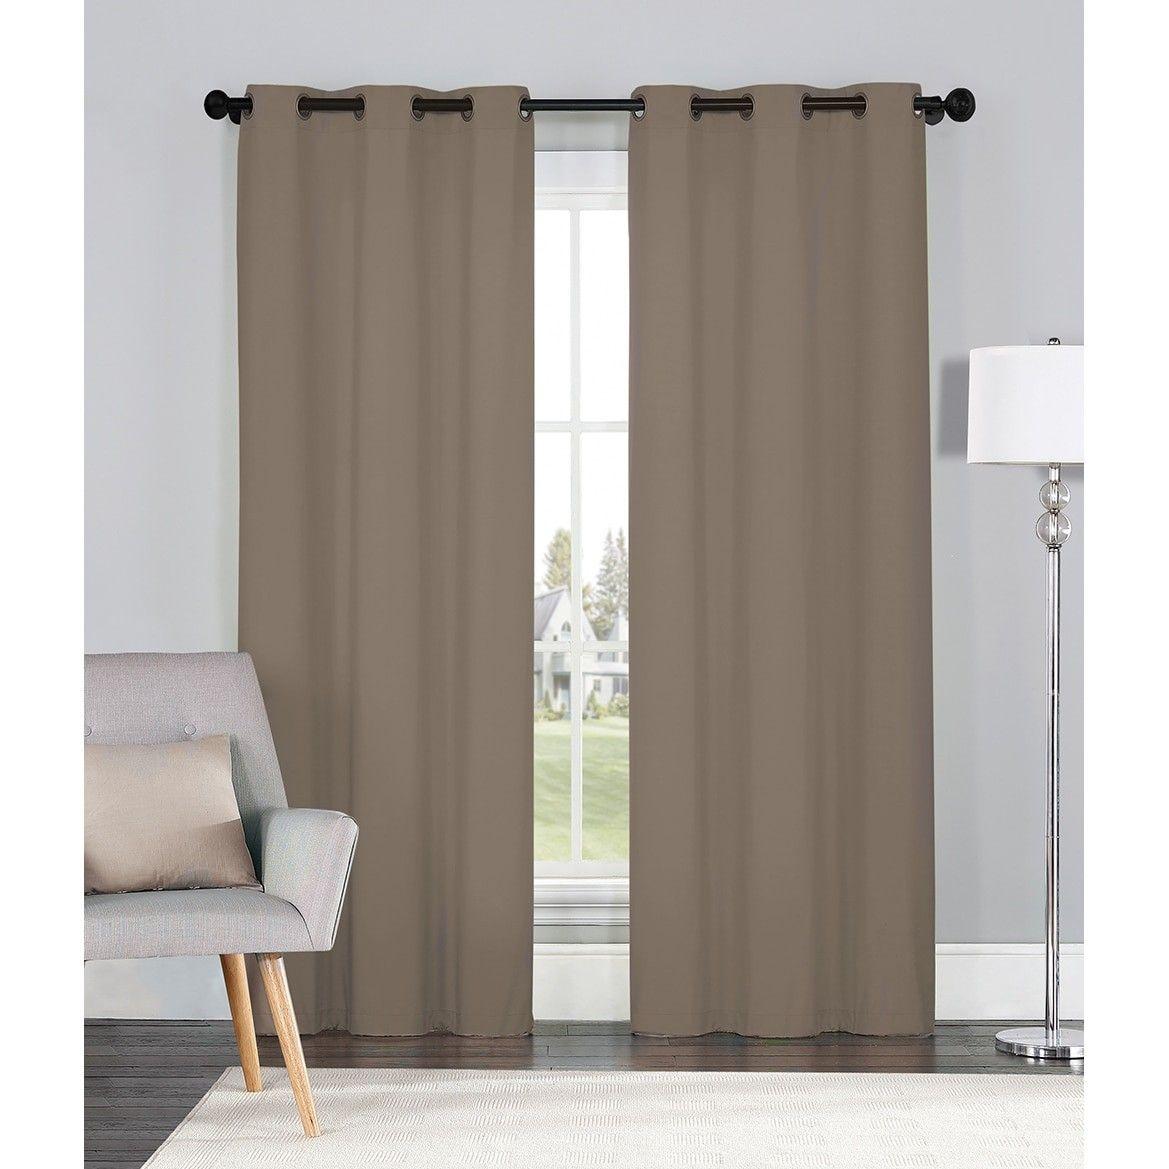 2 Blackout Room Darkening Window Curtains Taupe Embossed Trellis Panel Pair